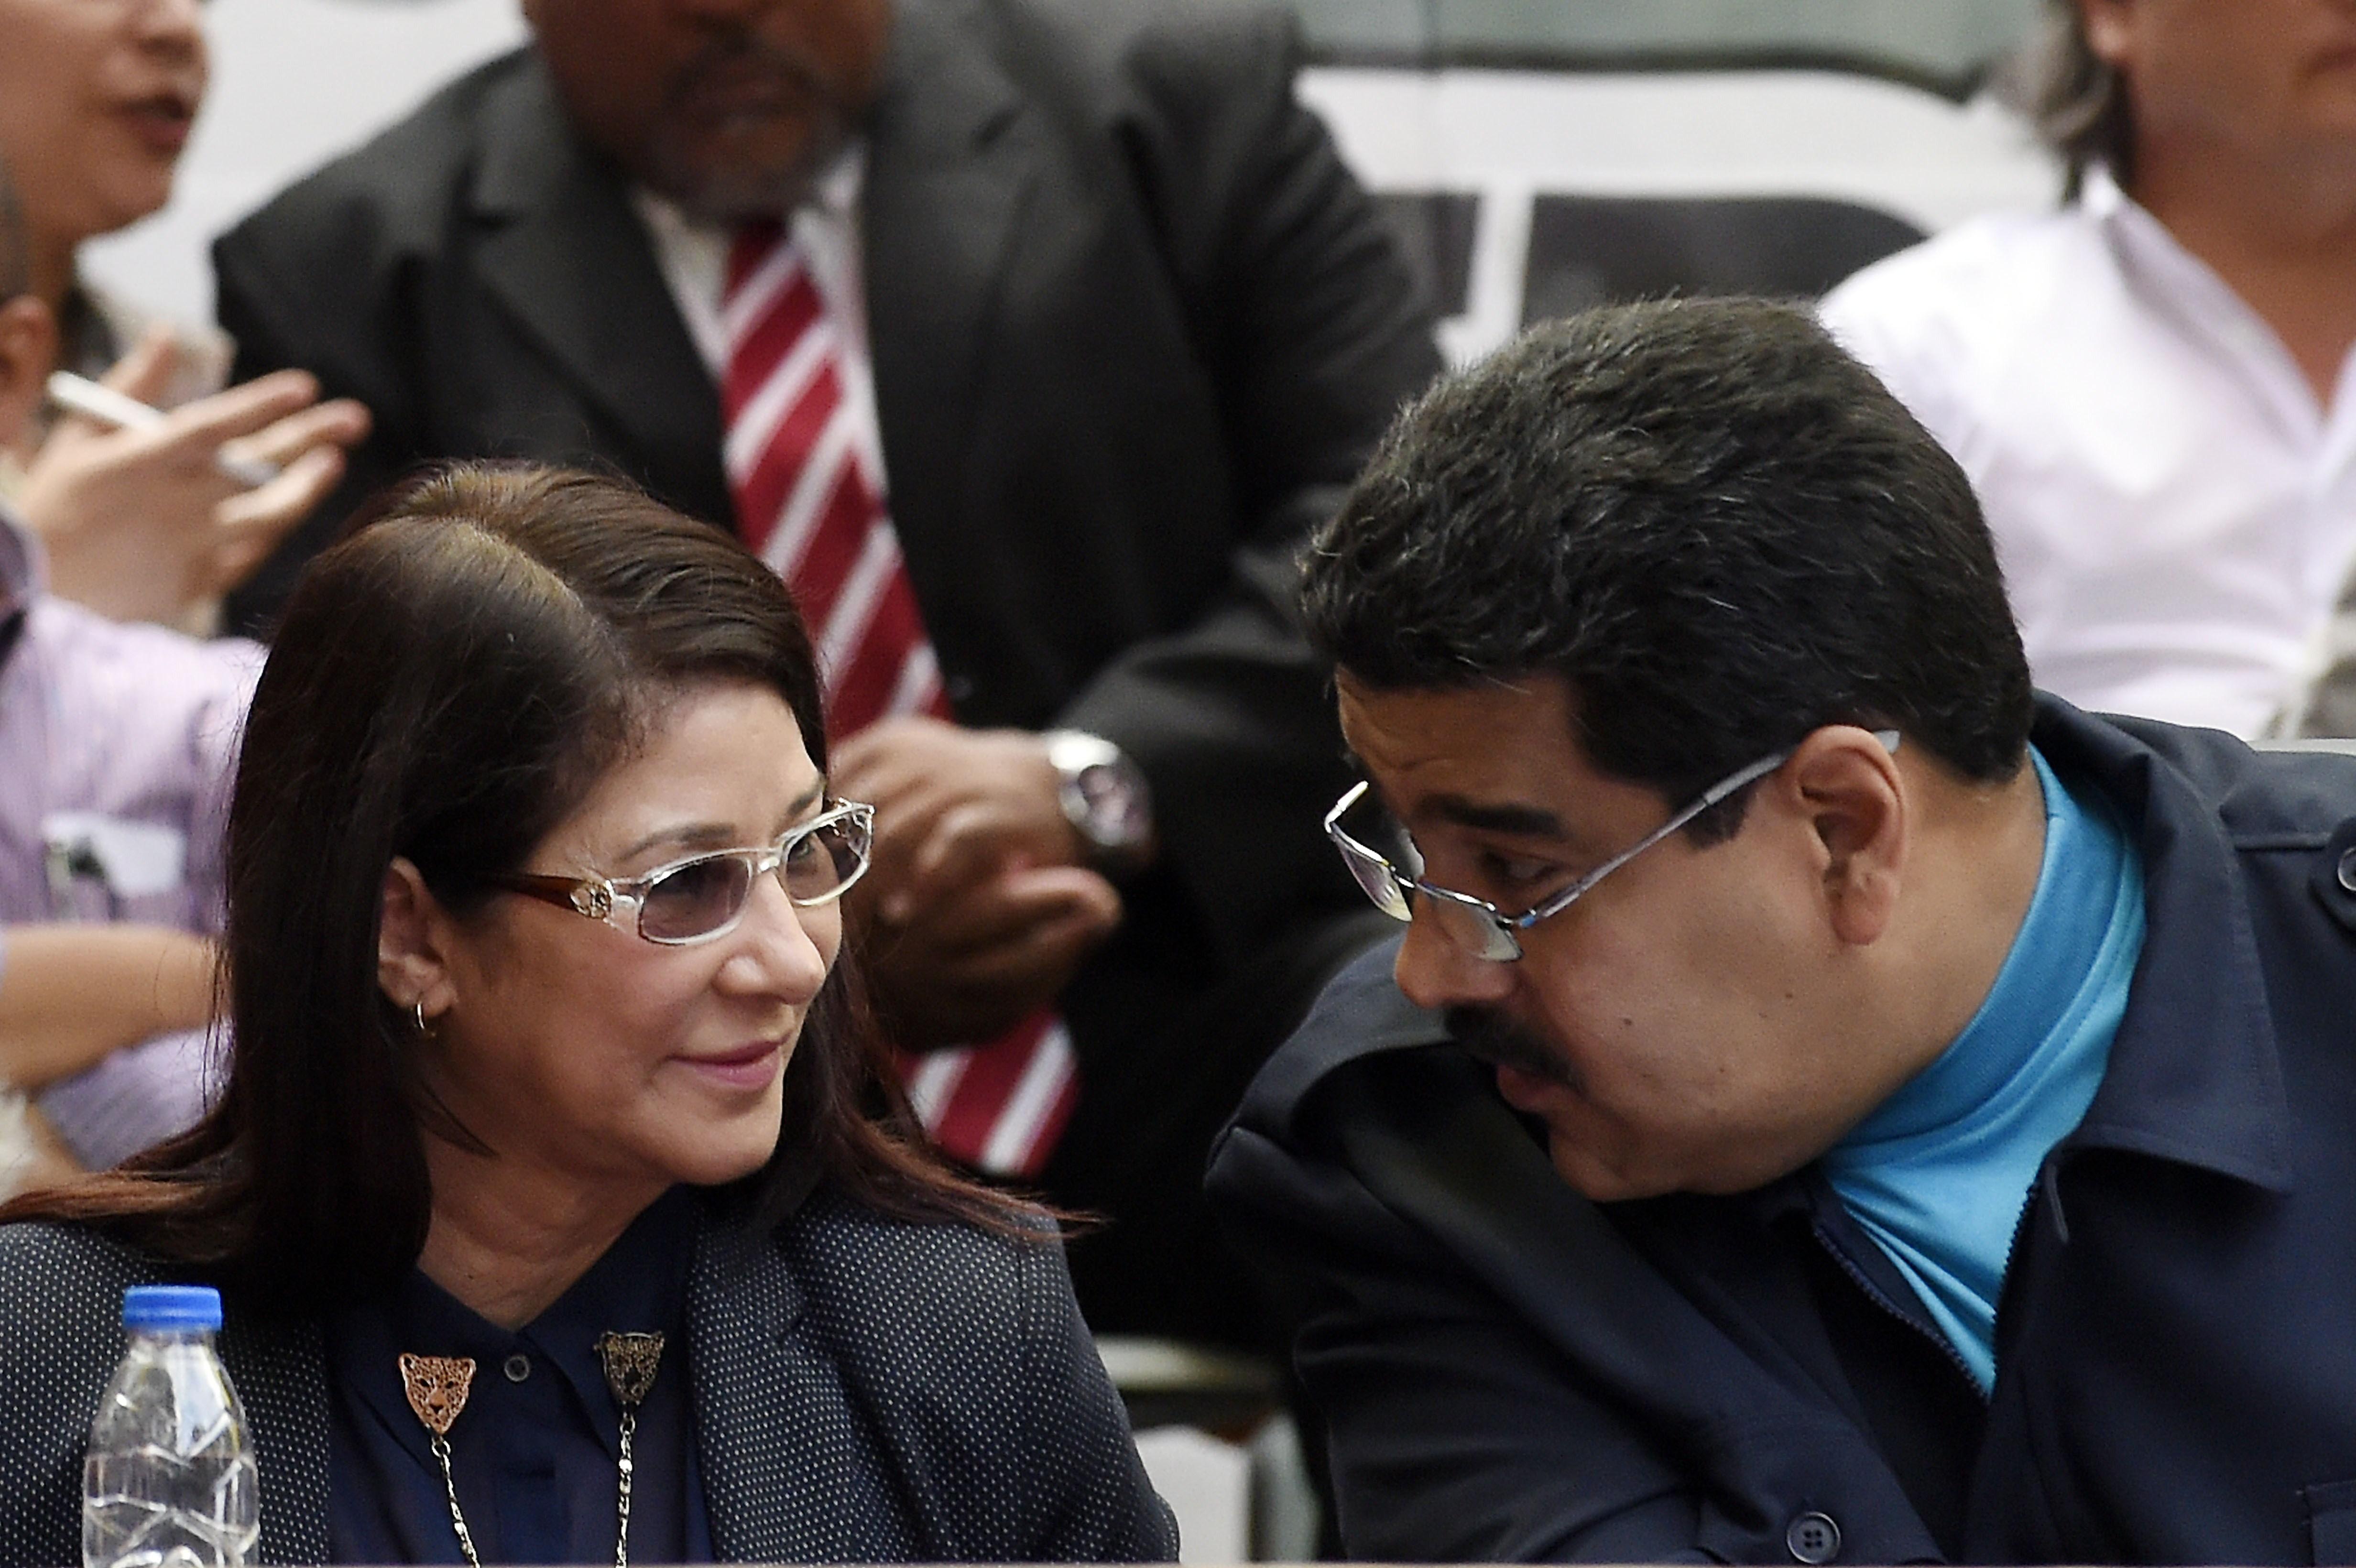 圖:2015年3月5日,委內瑞拉領導人尼古拉斯‧馬杜羅(Nicolas Maduro)和妻子西莉亞‧弗洛雷斯(Cilia Flores)。(JUAN BARRETO/AFP/Getty Images)